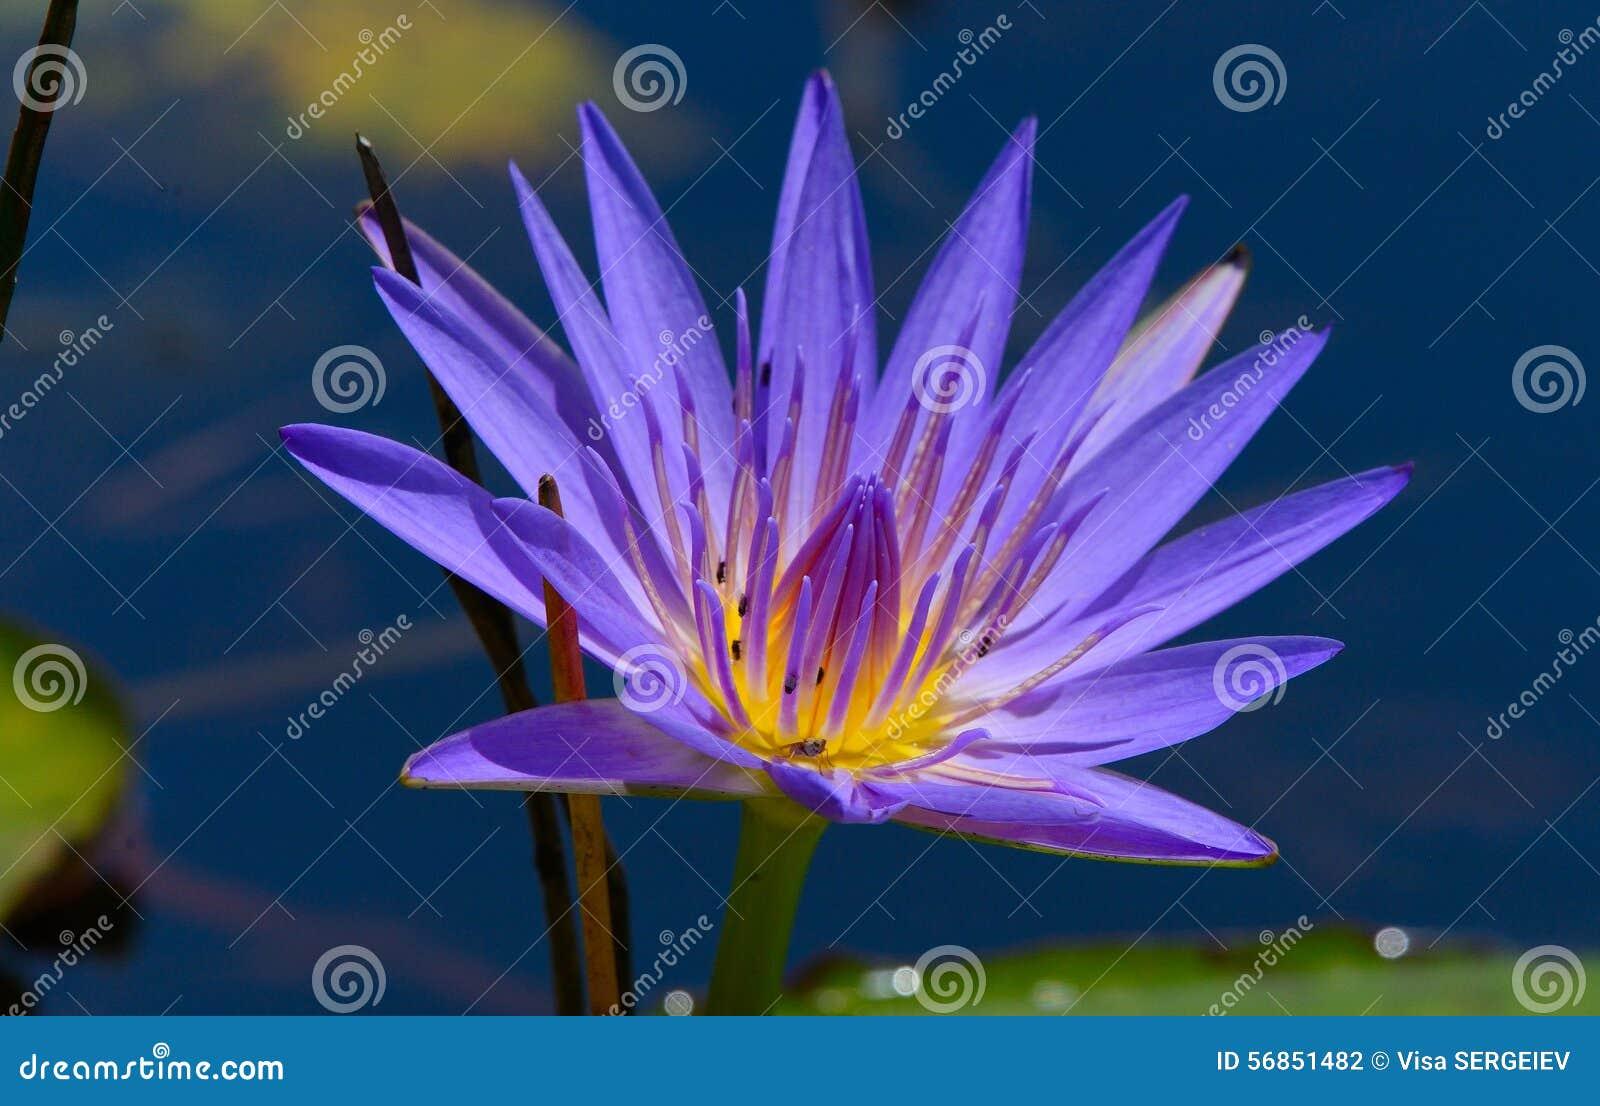 Blue Egyptian Lotus Stock Photo Image Of Blossom Peace 56851482